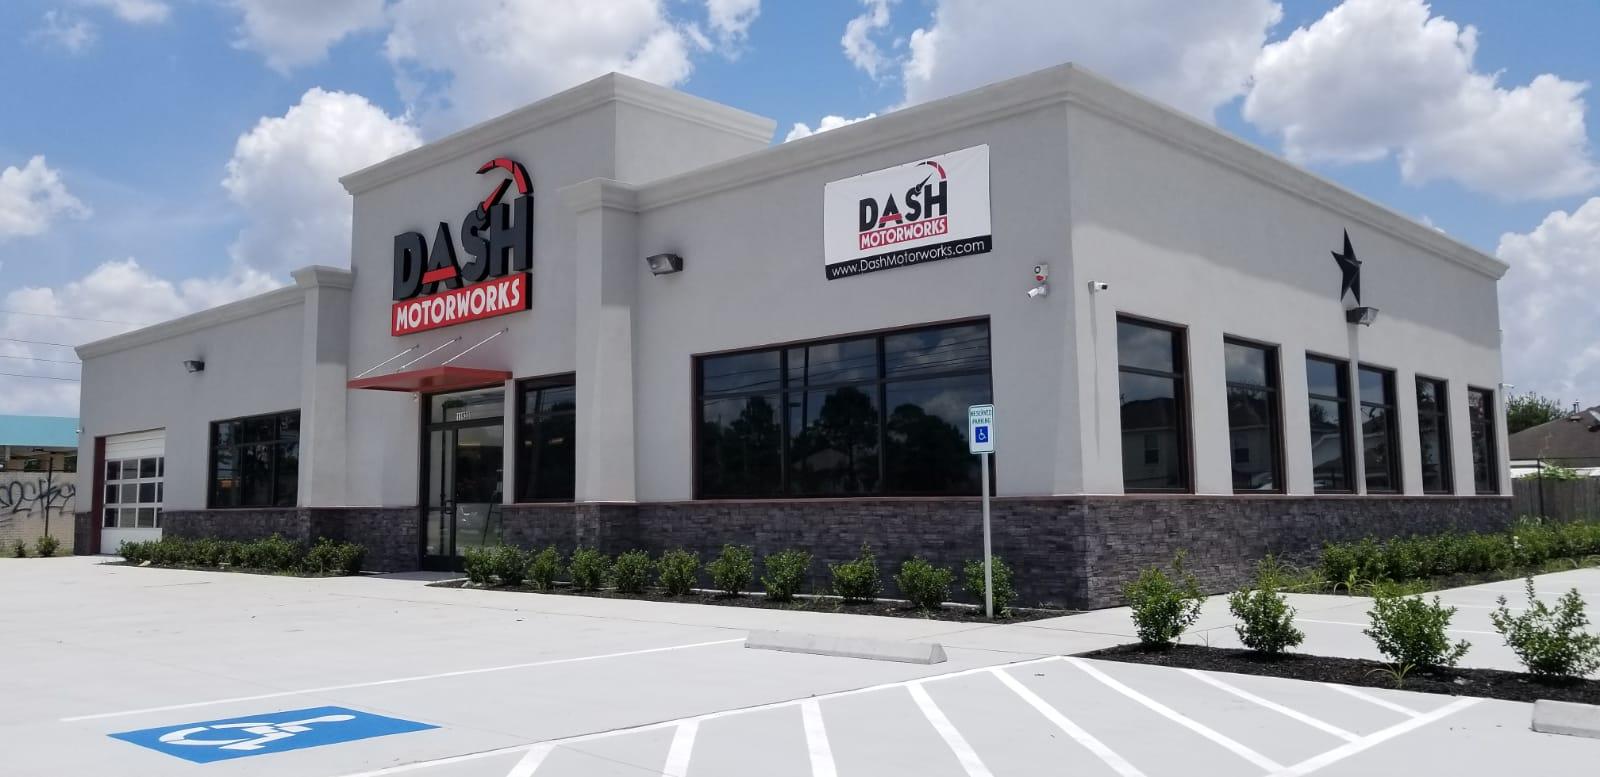 Dash Motorworks